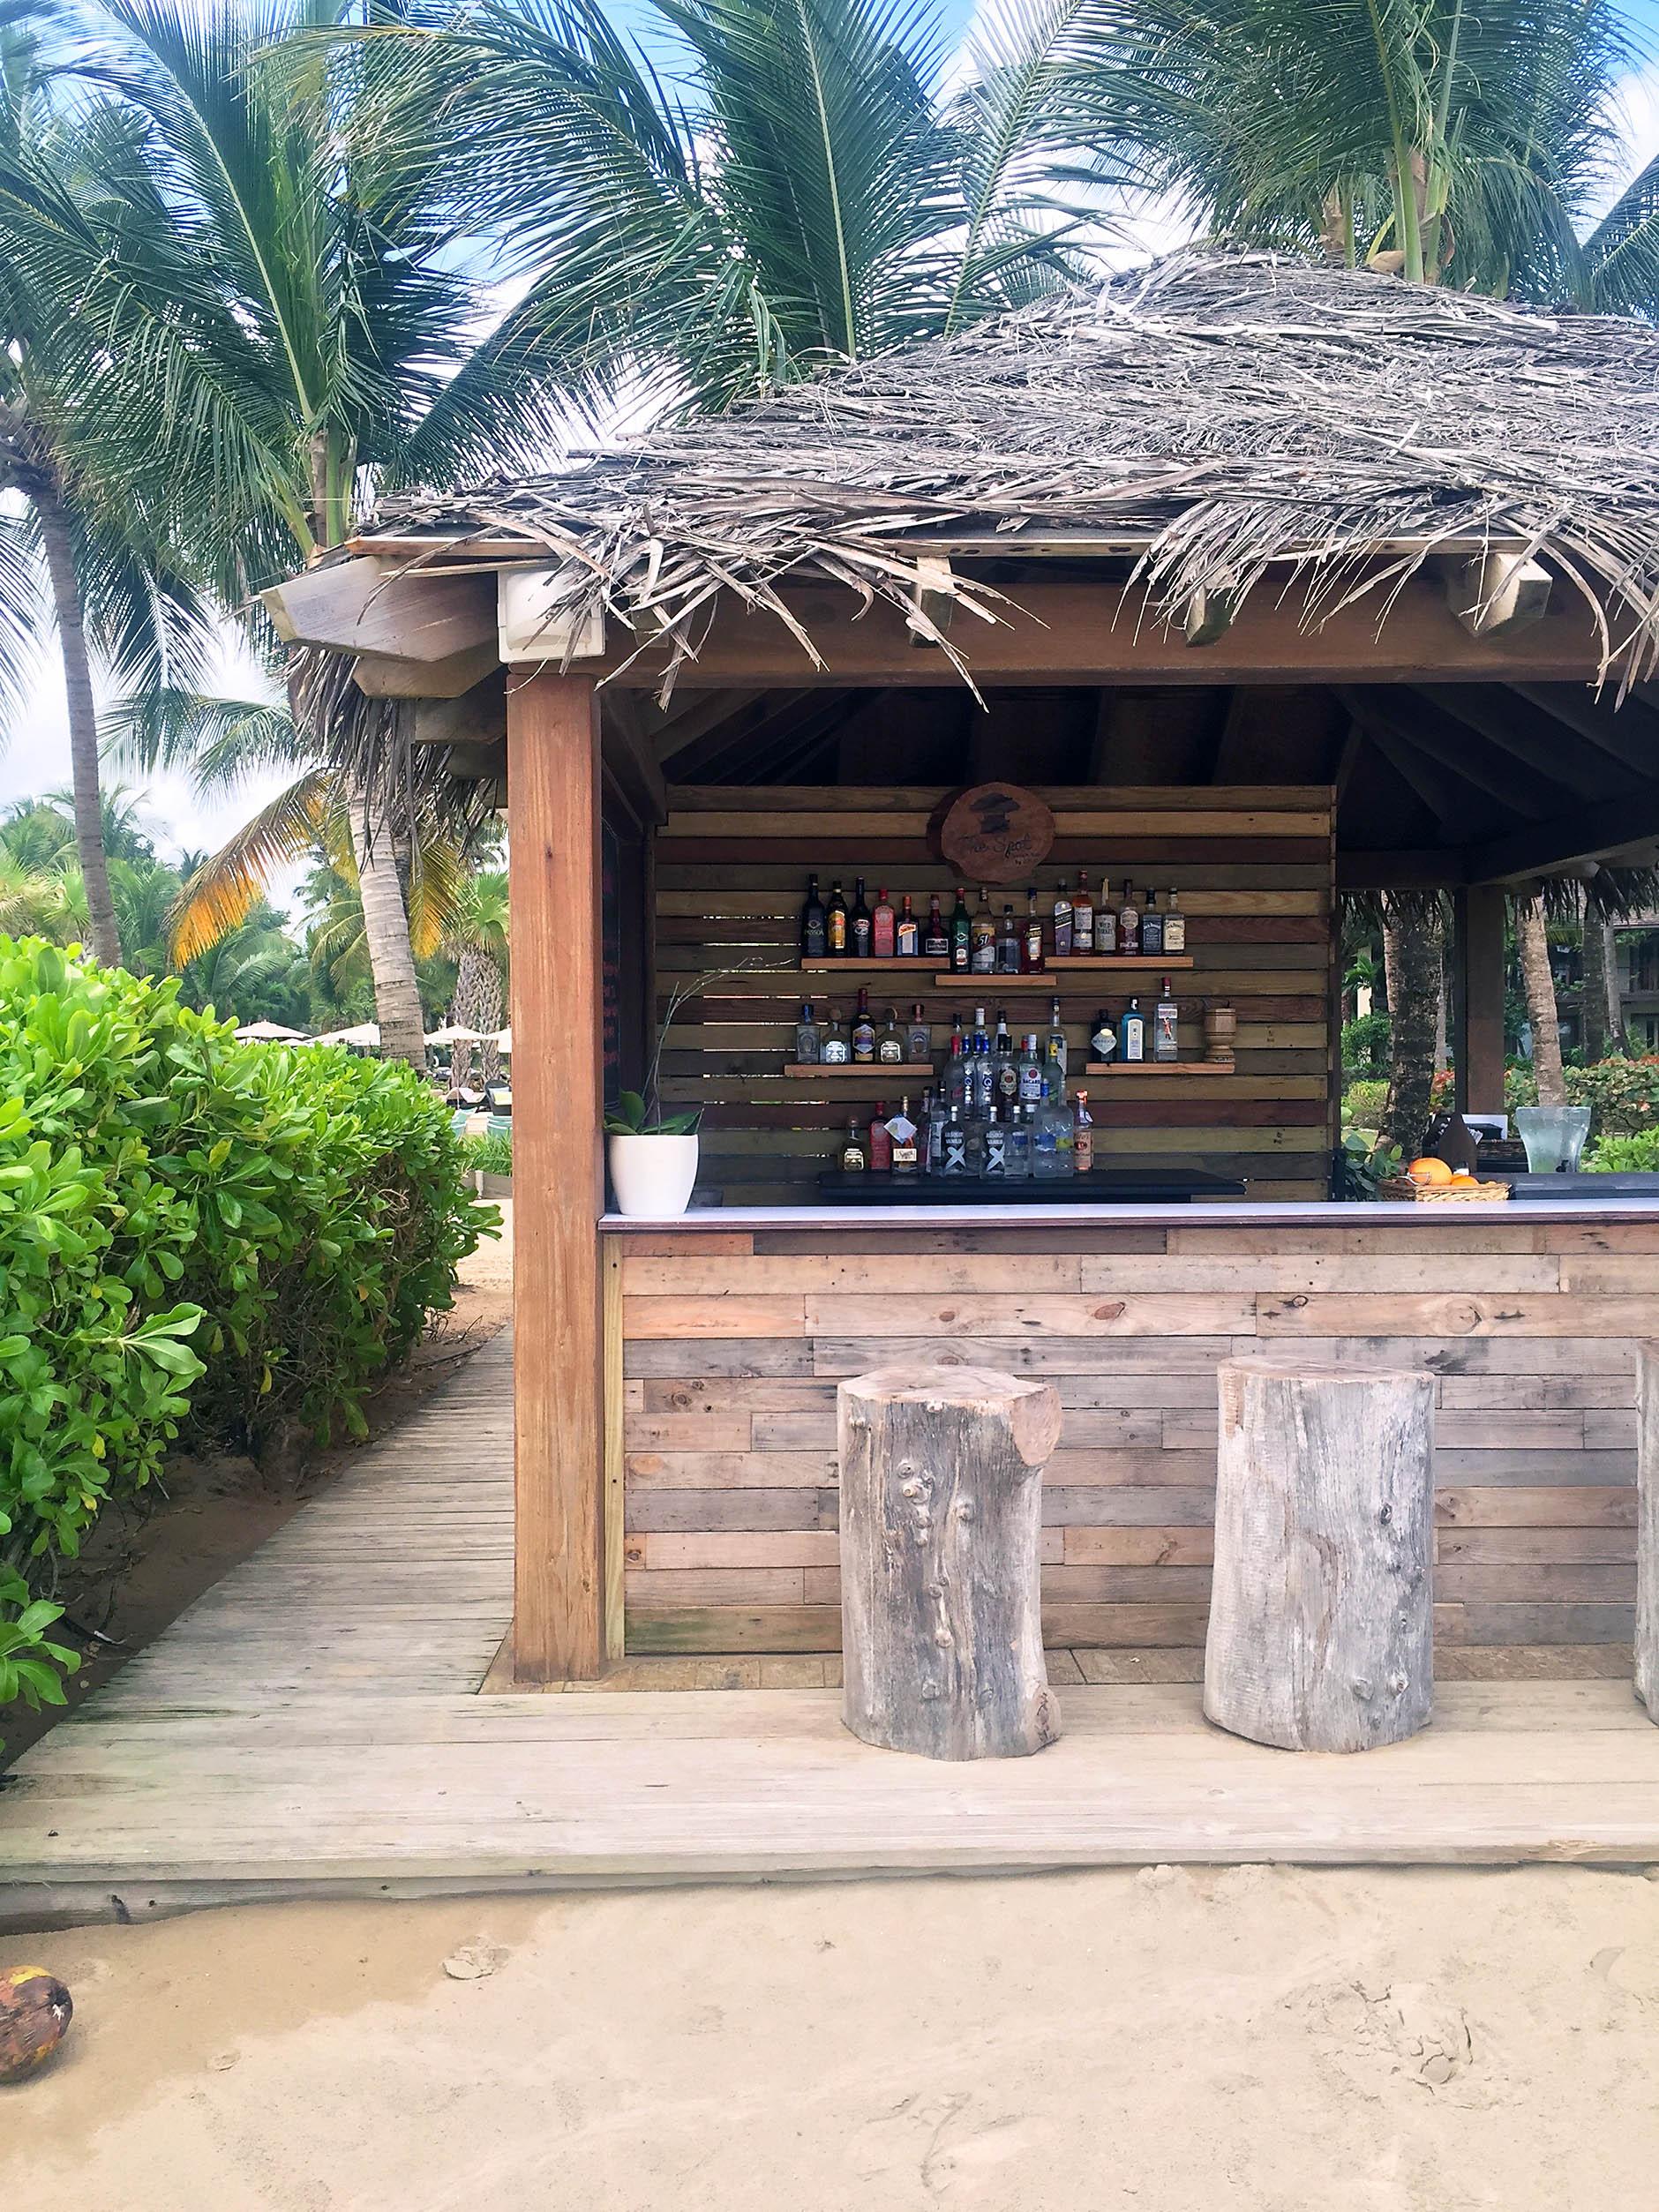 Anna Roufos Sosa of Noir Friday at The St. Regis Bahia Beach Resort Puerto Rico